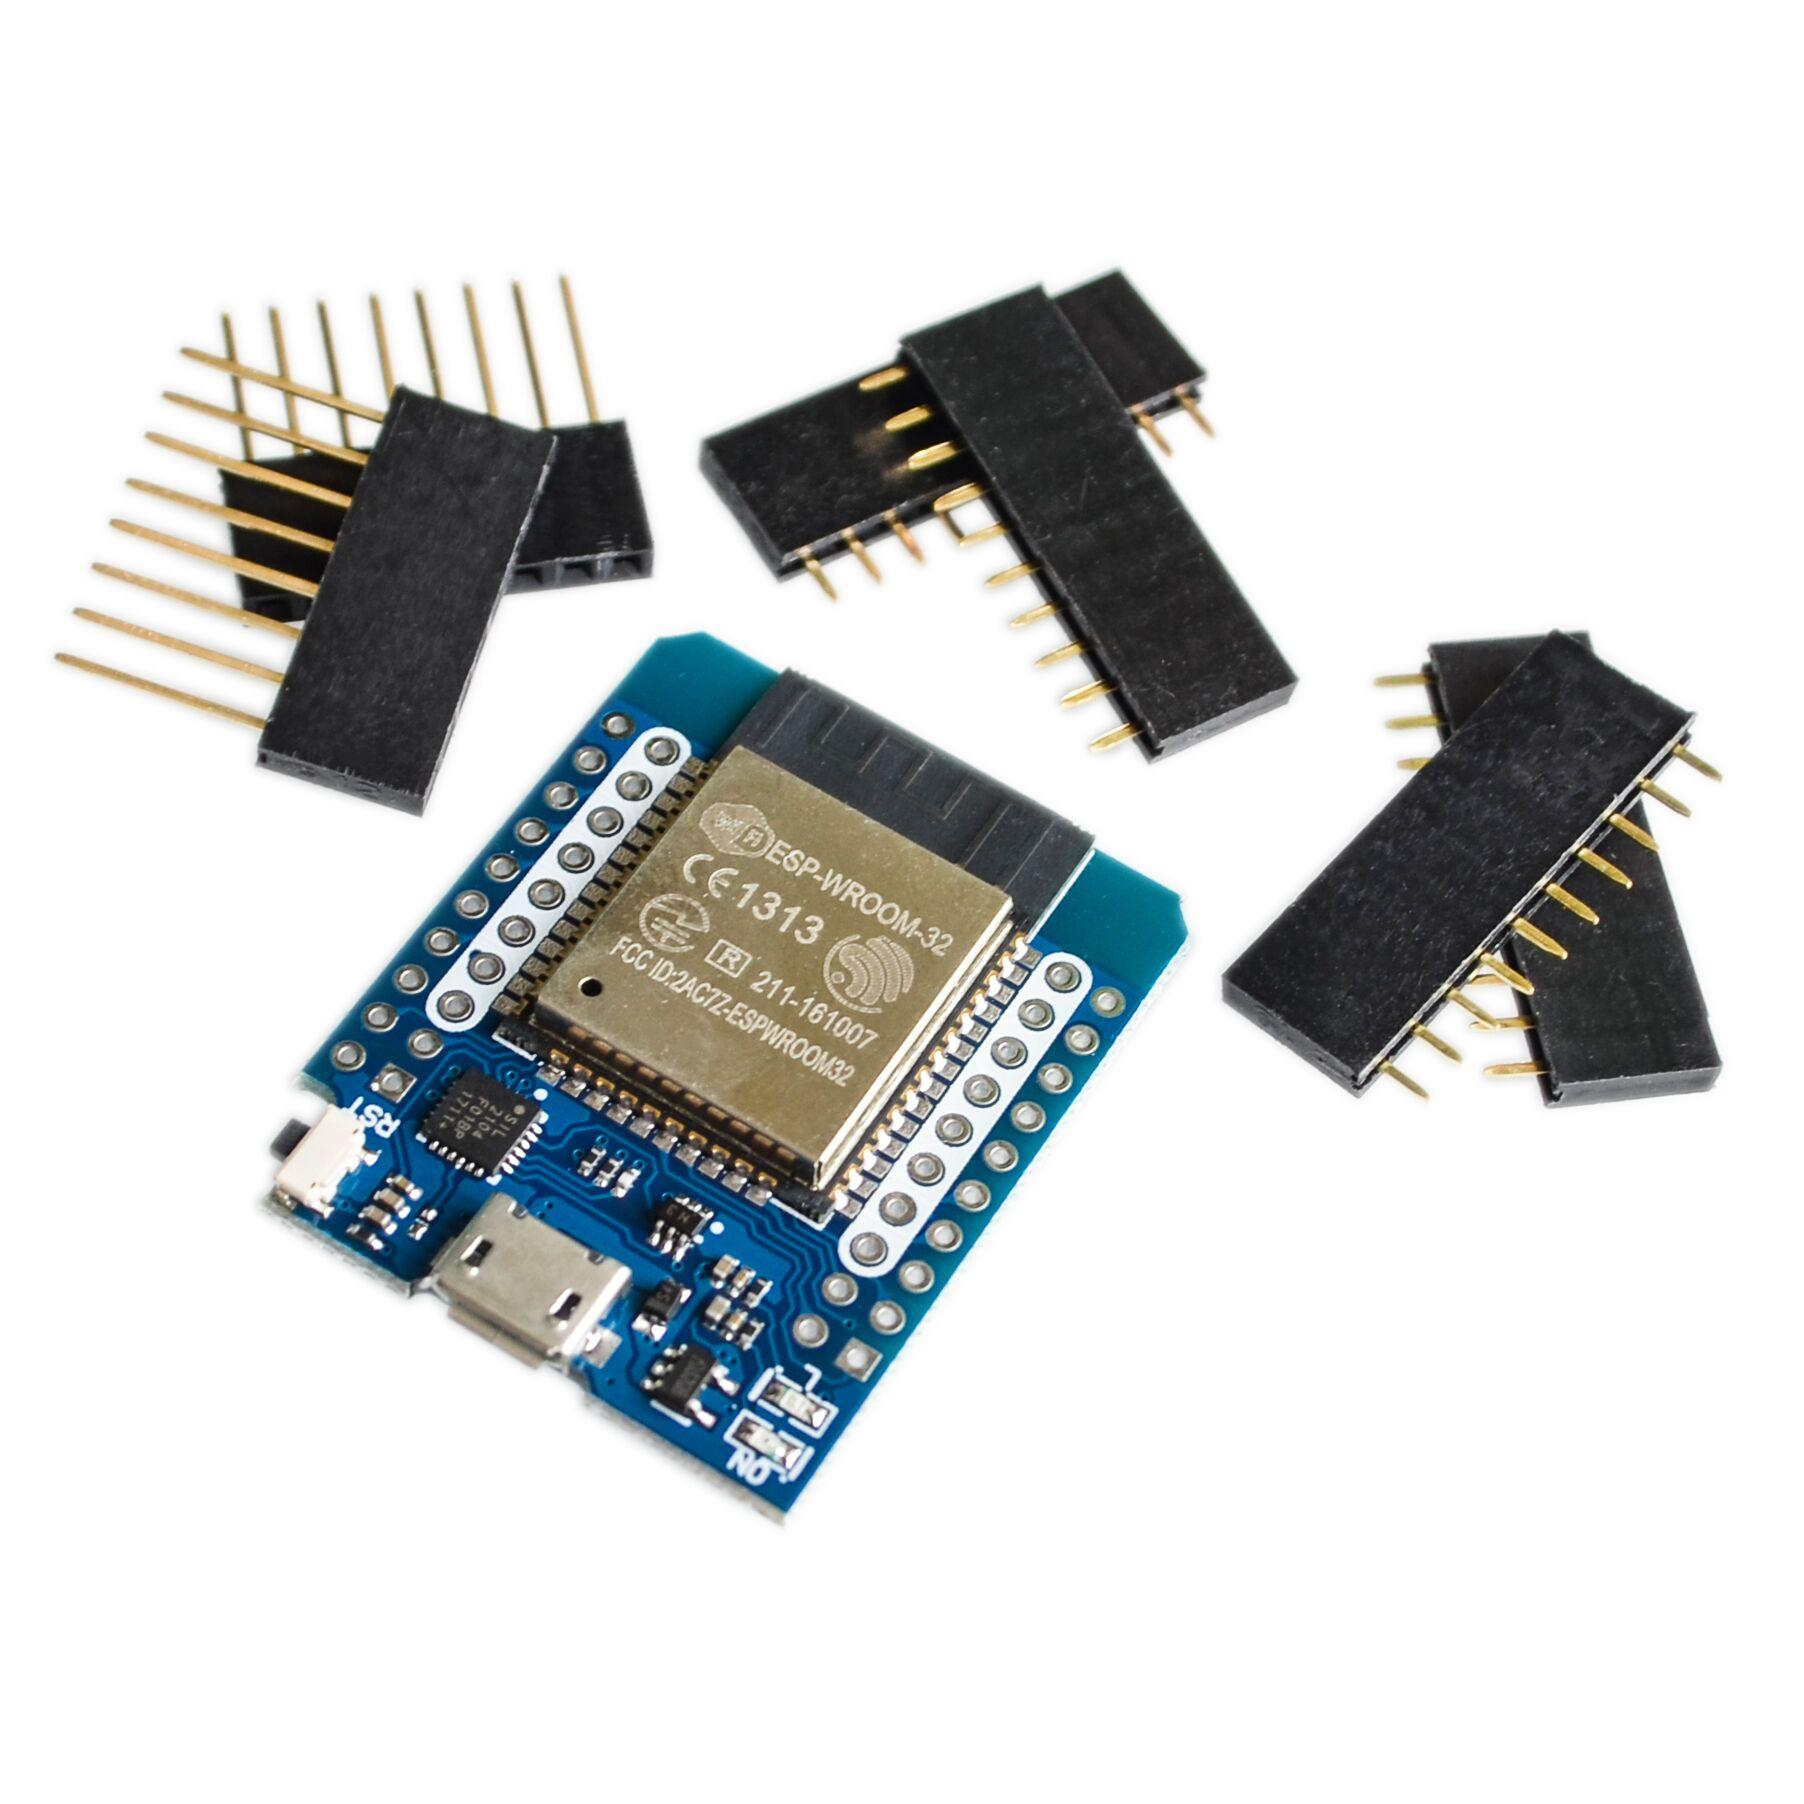 LIVE D1 Mini ESP32 ESP-32 WiFi+Bluetooth Internet Of Things Development Board Based ESP8266 Fully Functional